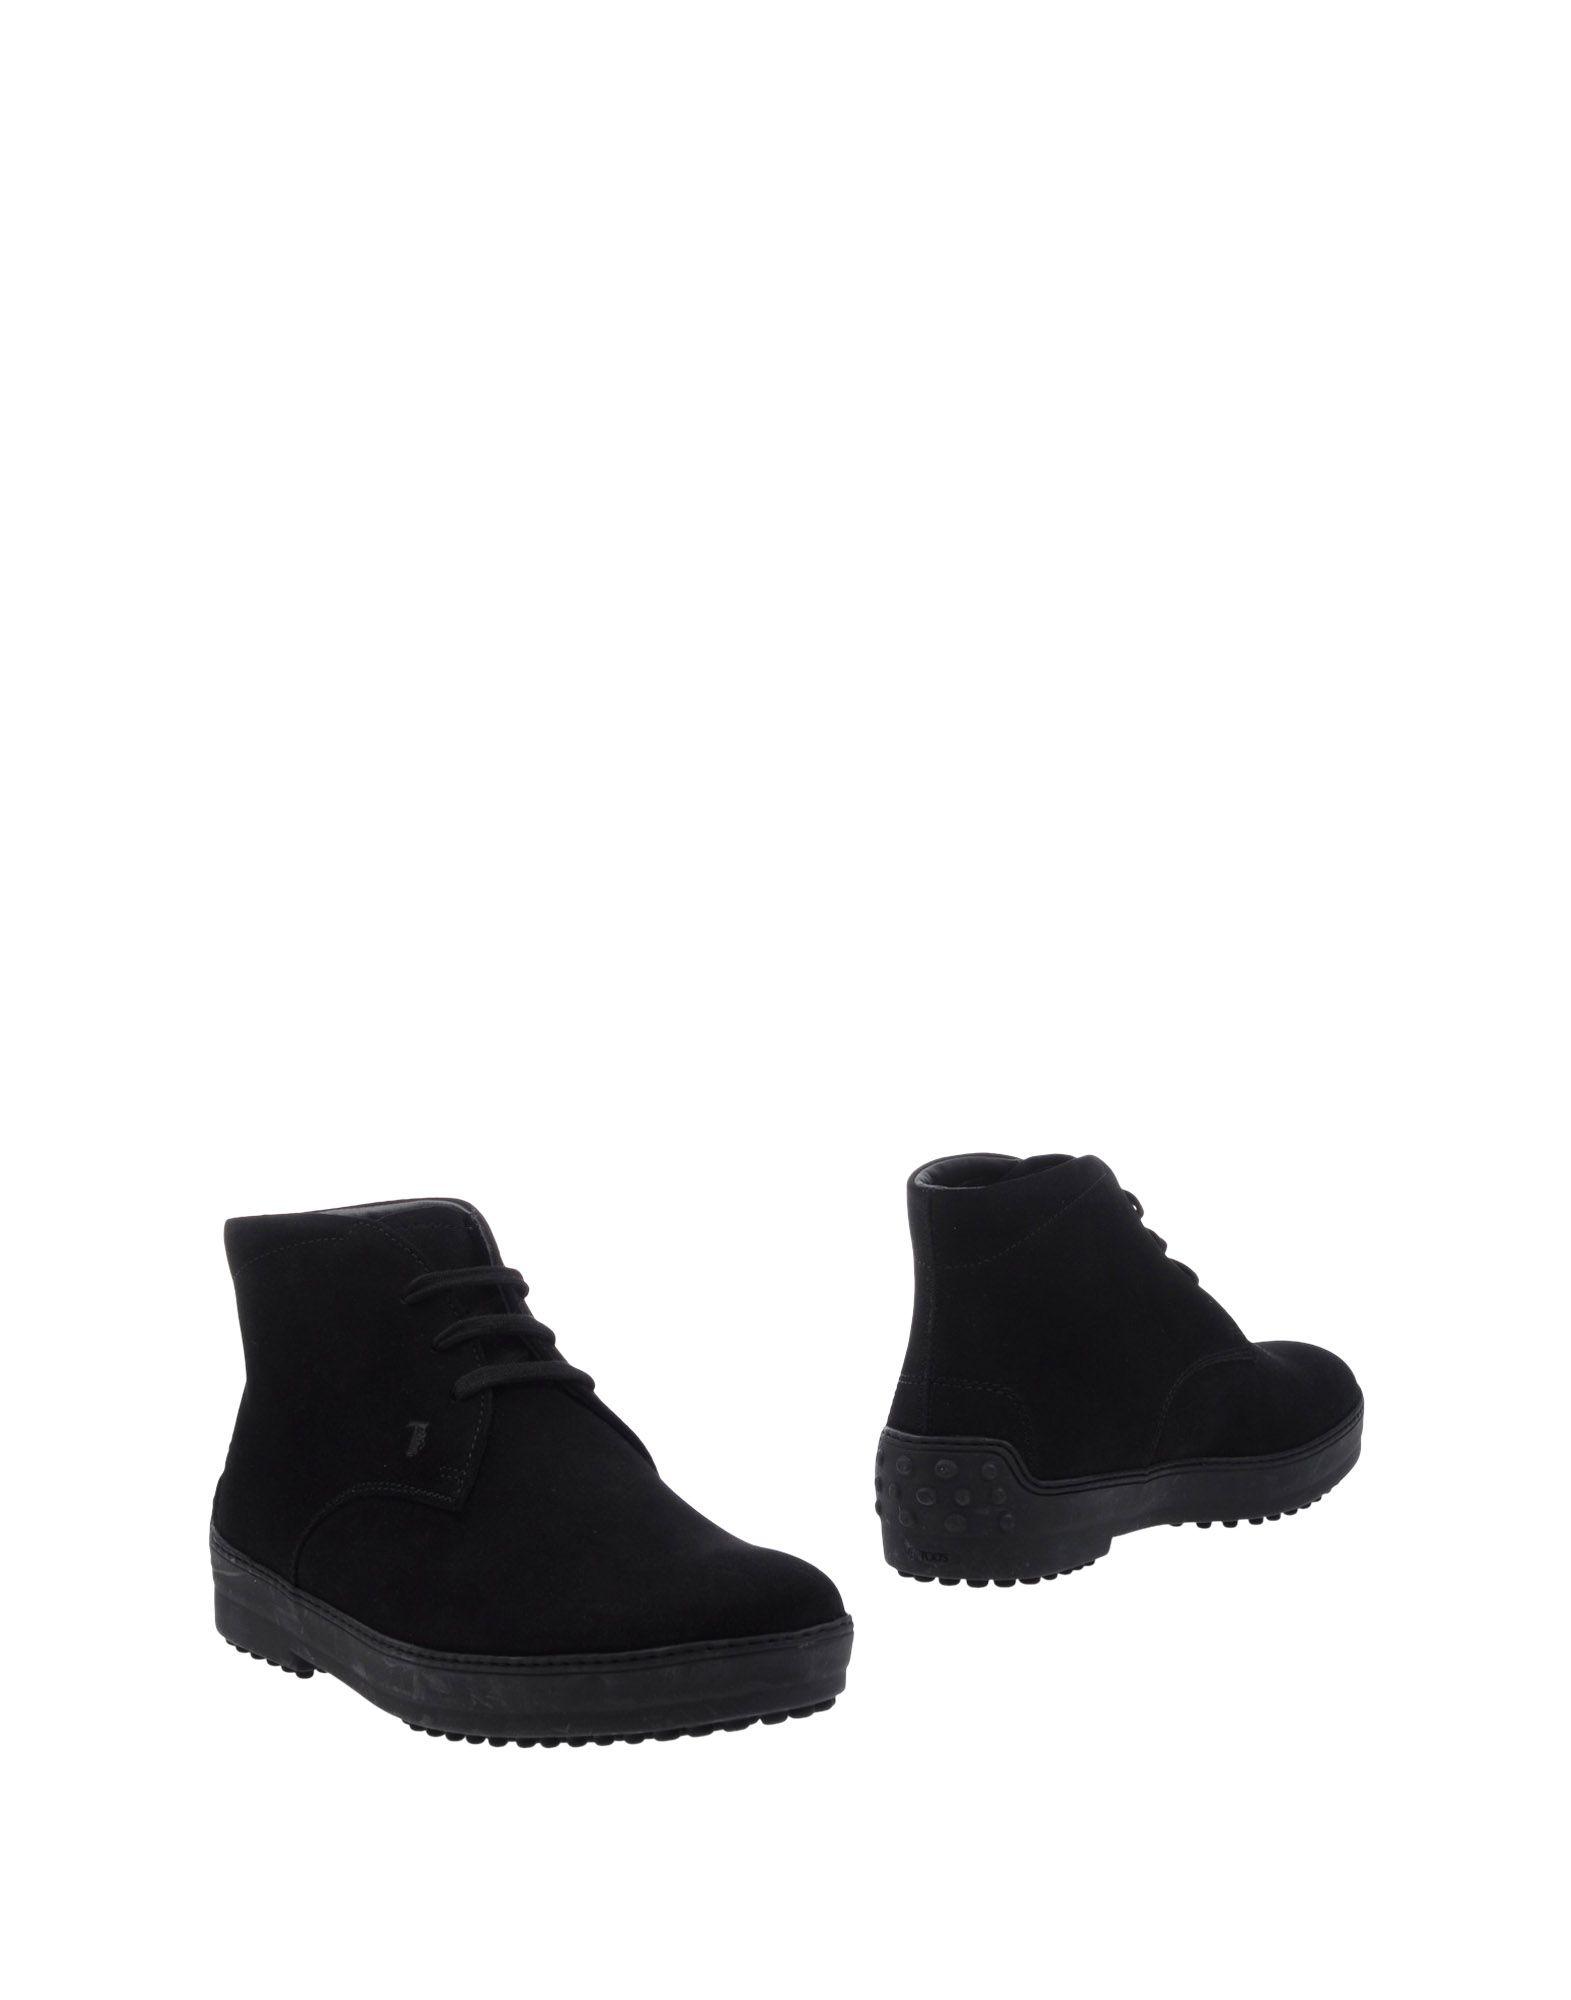 Tod's Stiefelette Herren  11299246KE Schuhe Gute Qualität beliebte Schuhe 11299246KE 60e70b